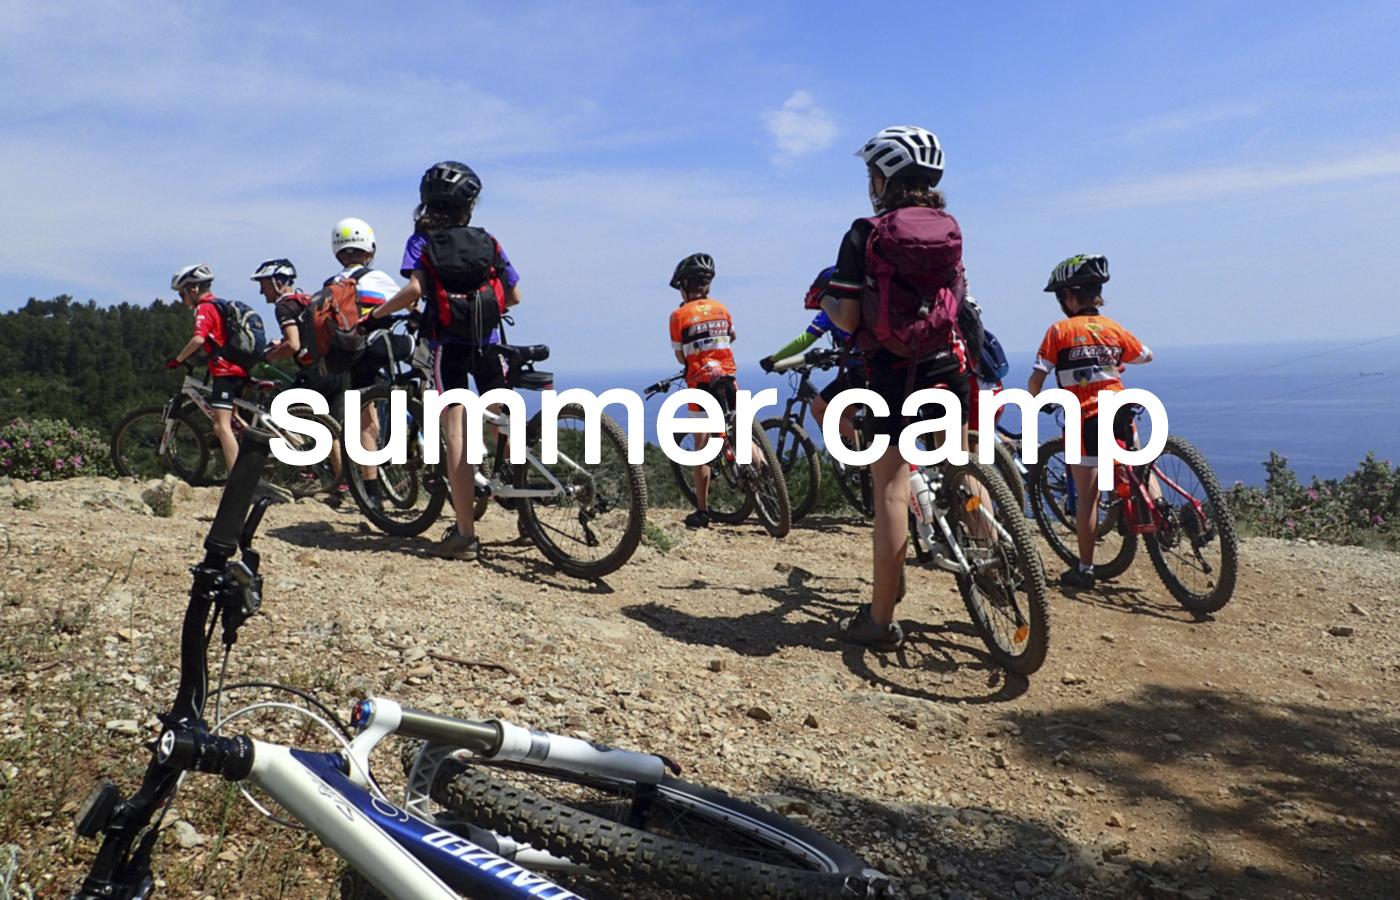 corsi di bicicletta:summer camp